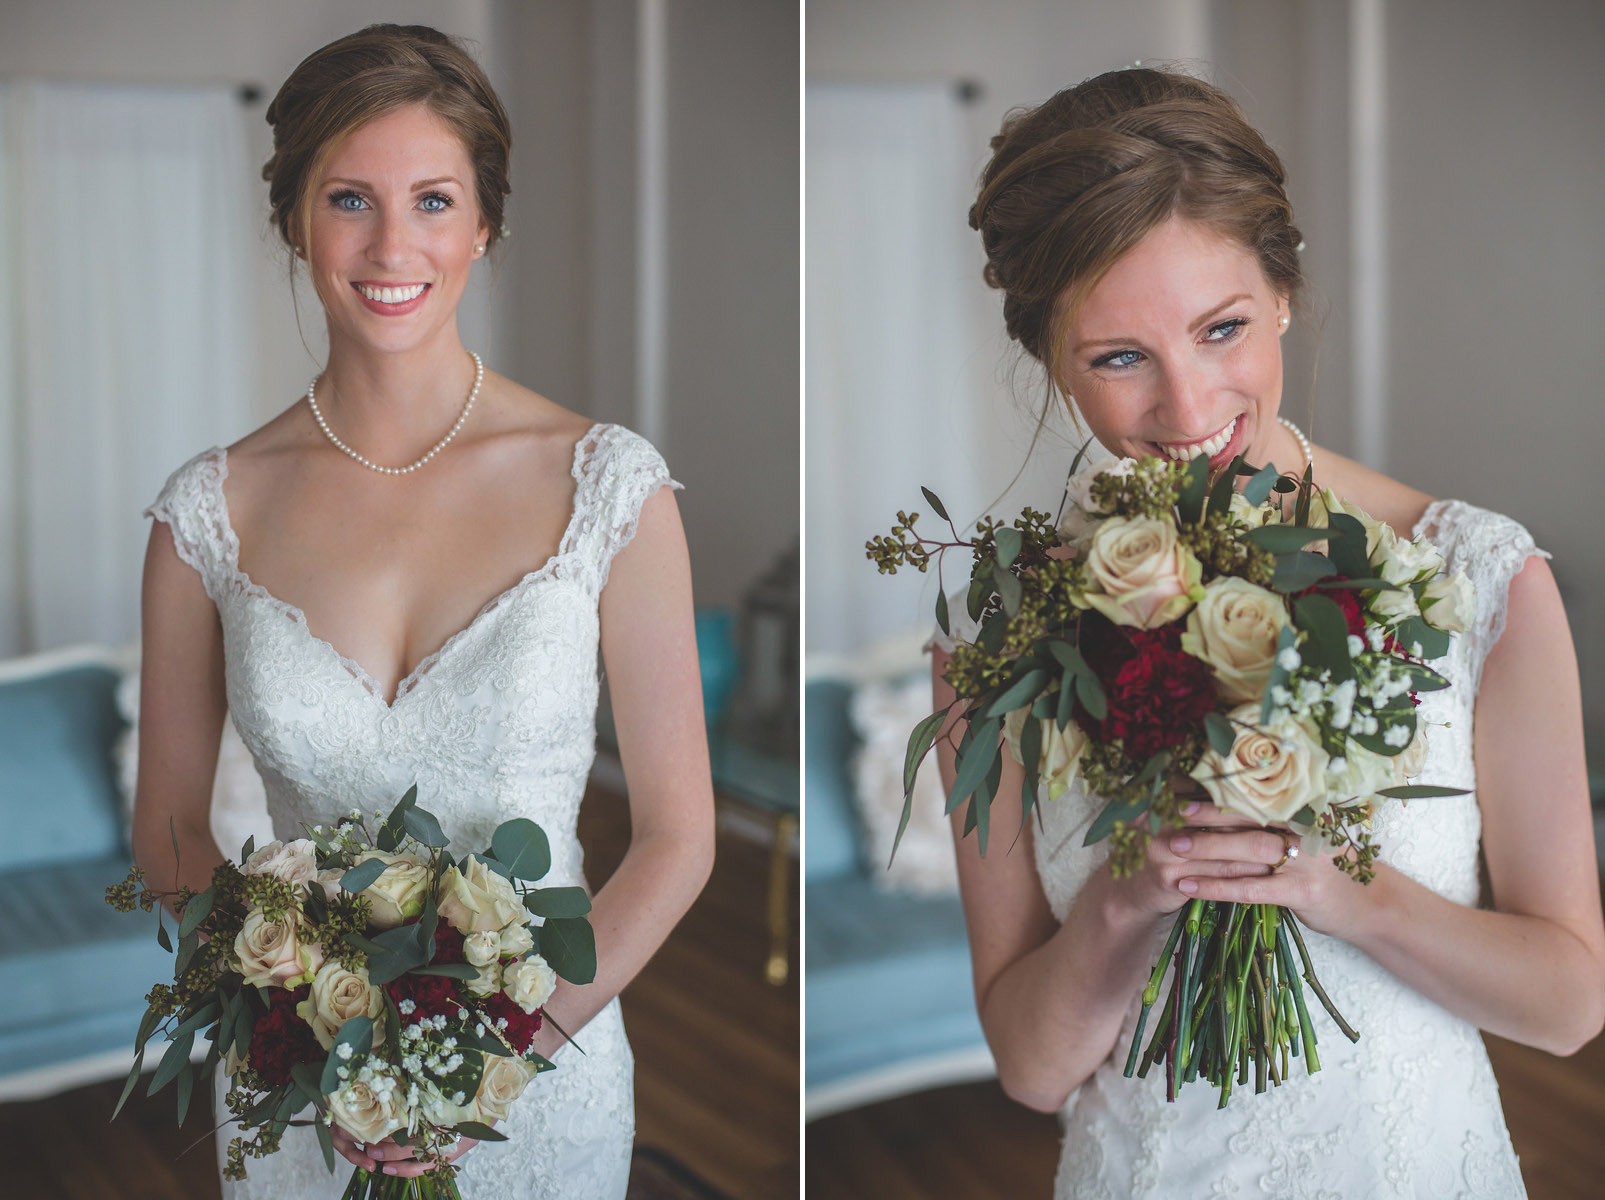 Adam-Szrmack-Bowing-the-white-room-st-augustine-wedding-photographer-39.jpg